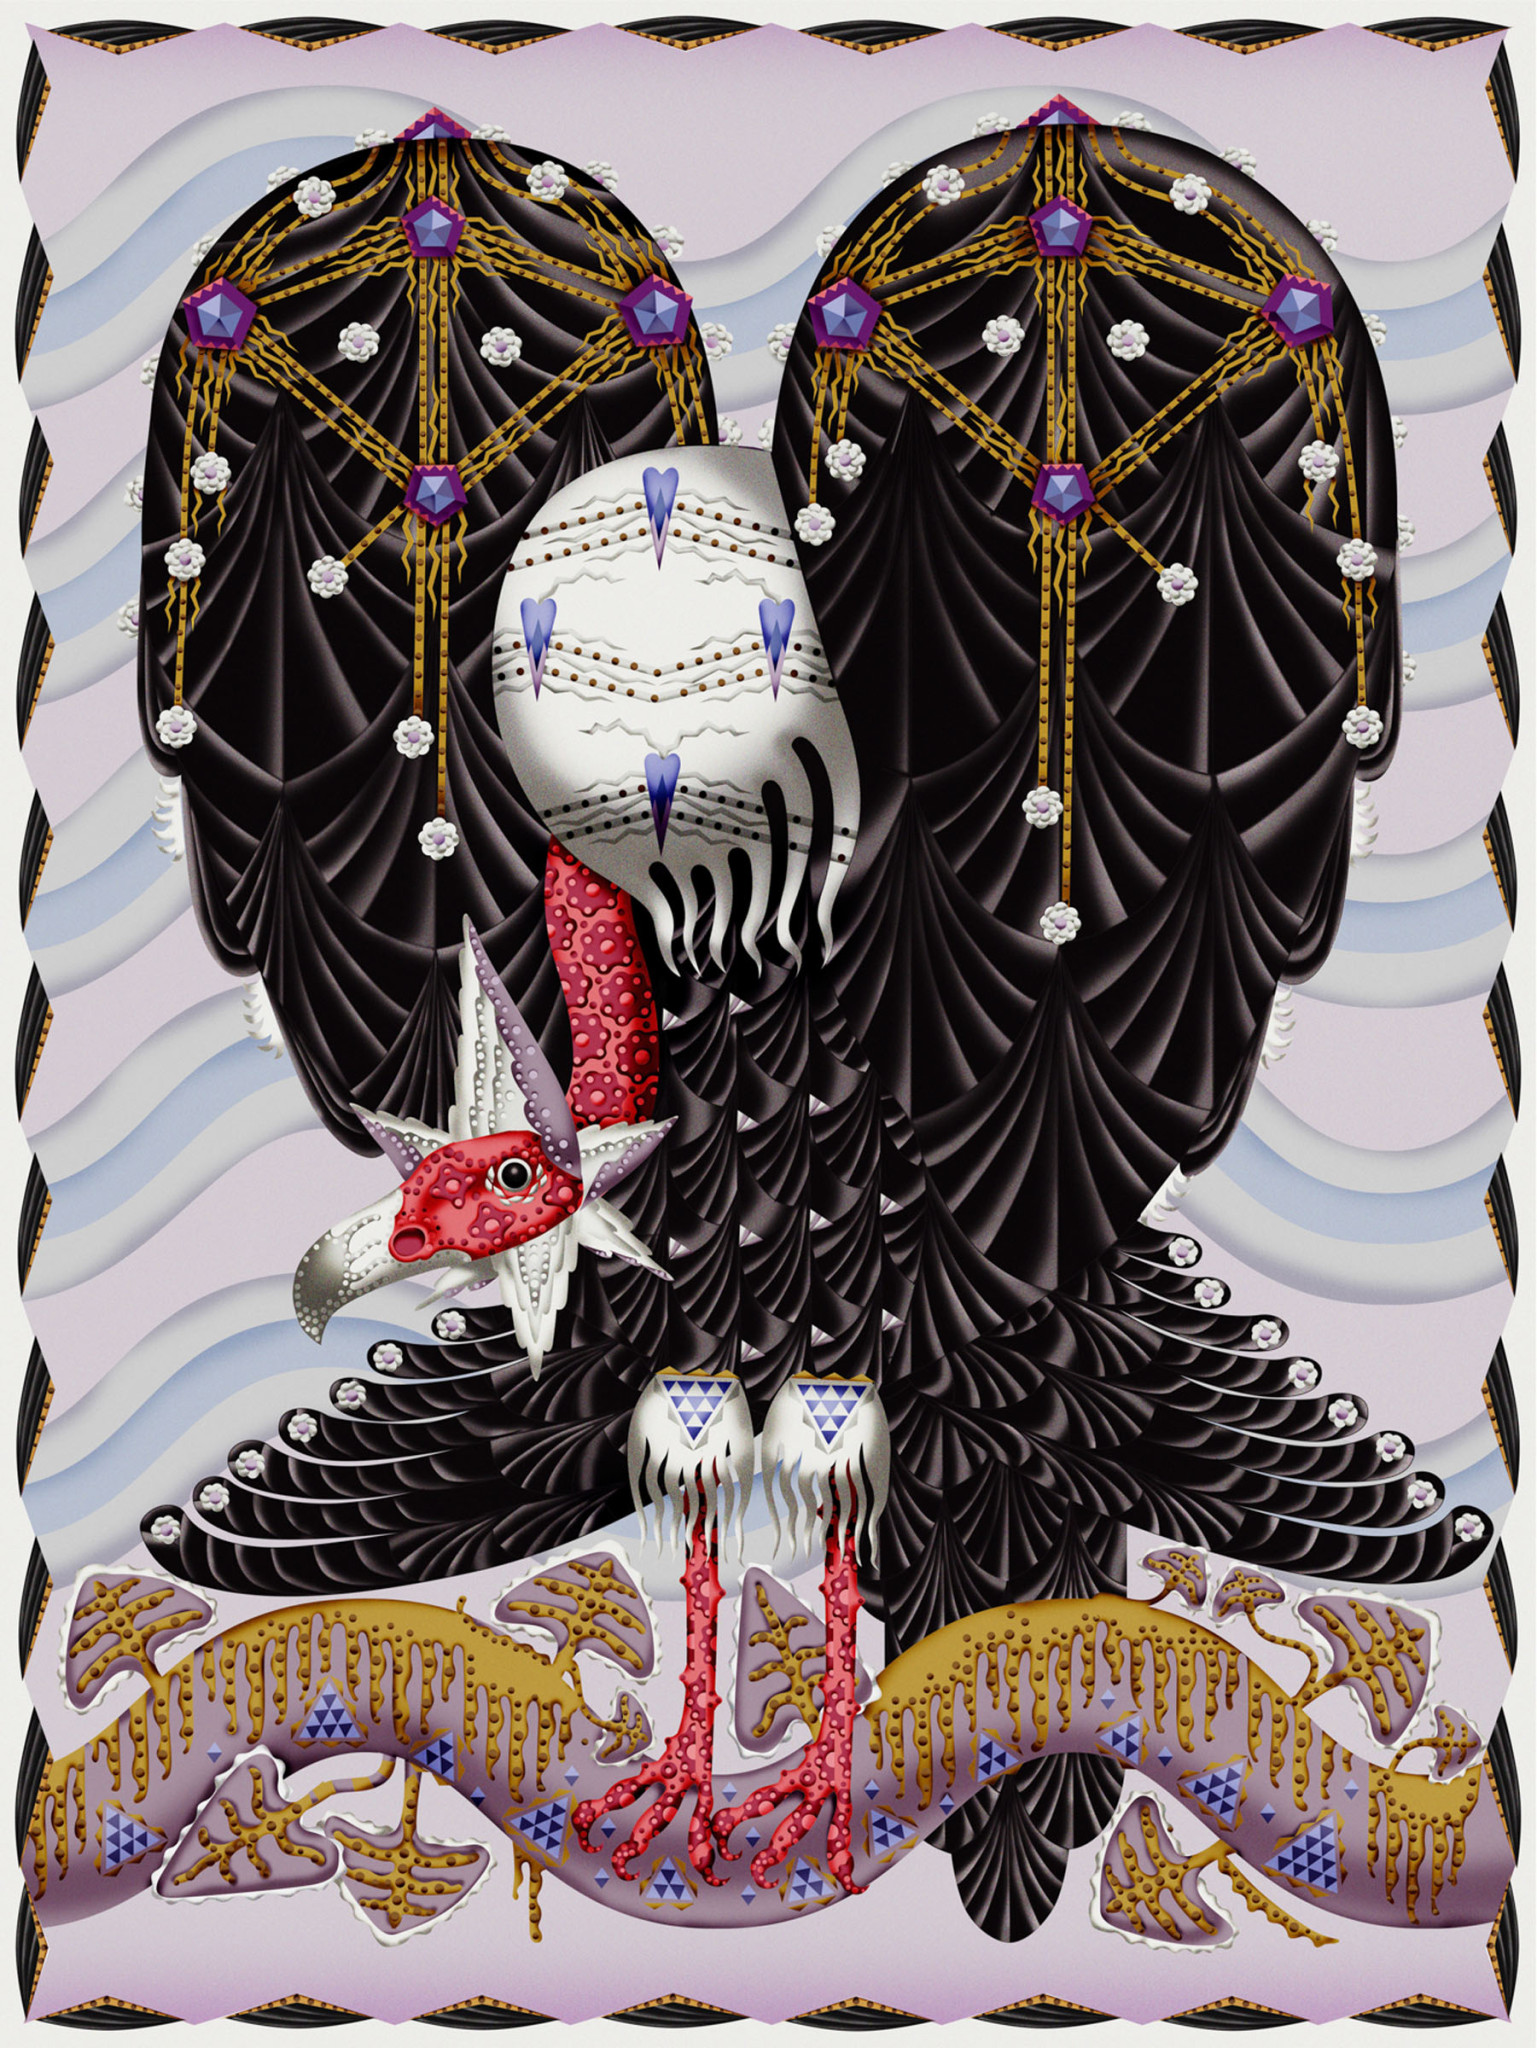 klaus-haapaniemi_vulture_200x300_lr